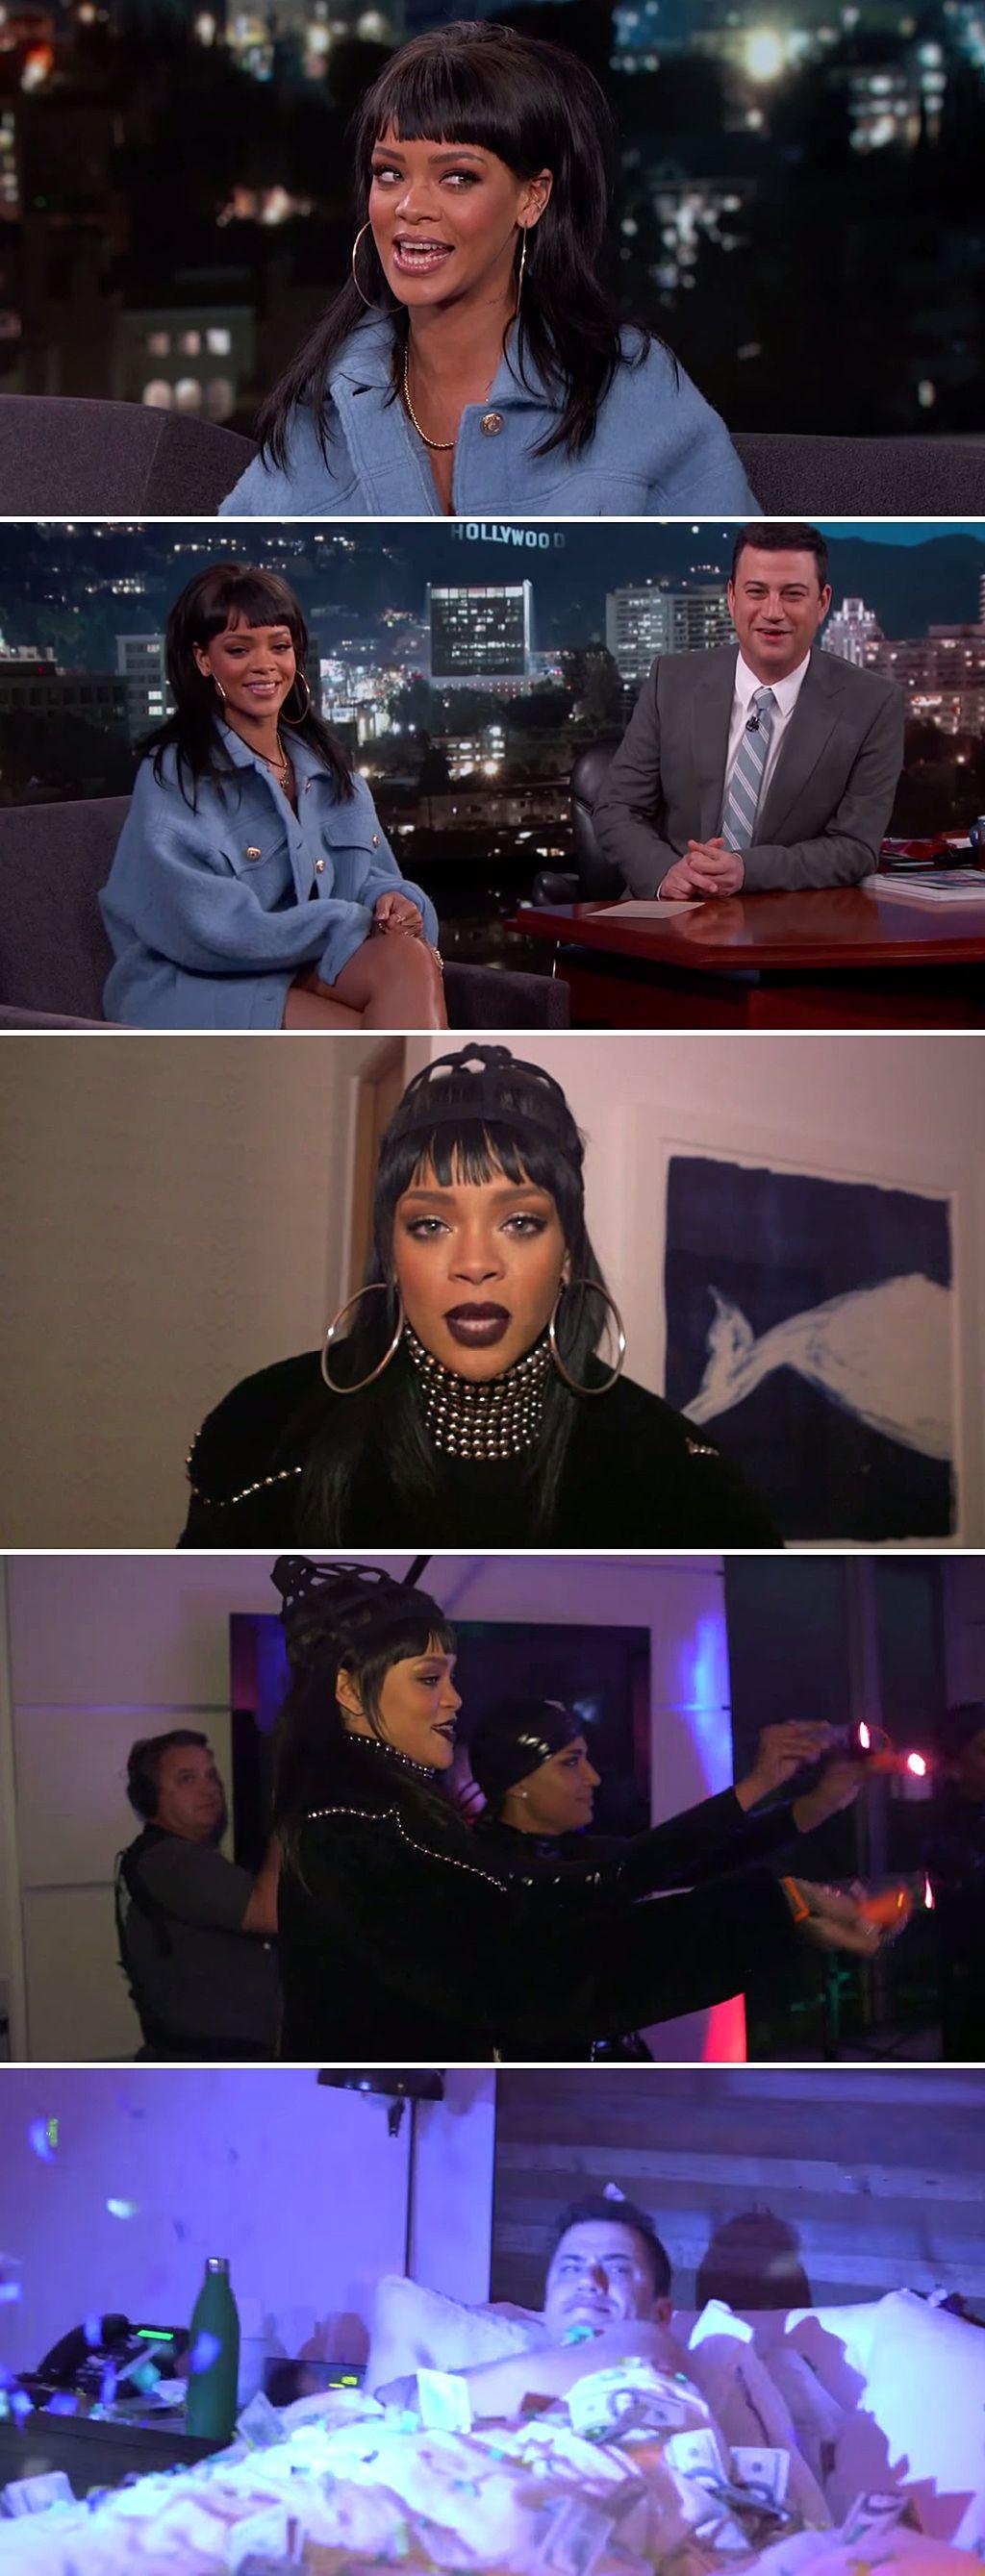 Rihanna played a hilarious prank on Jimmy Kimmel last week. She ...